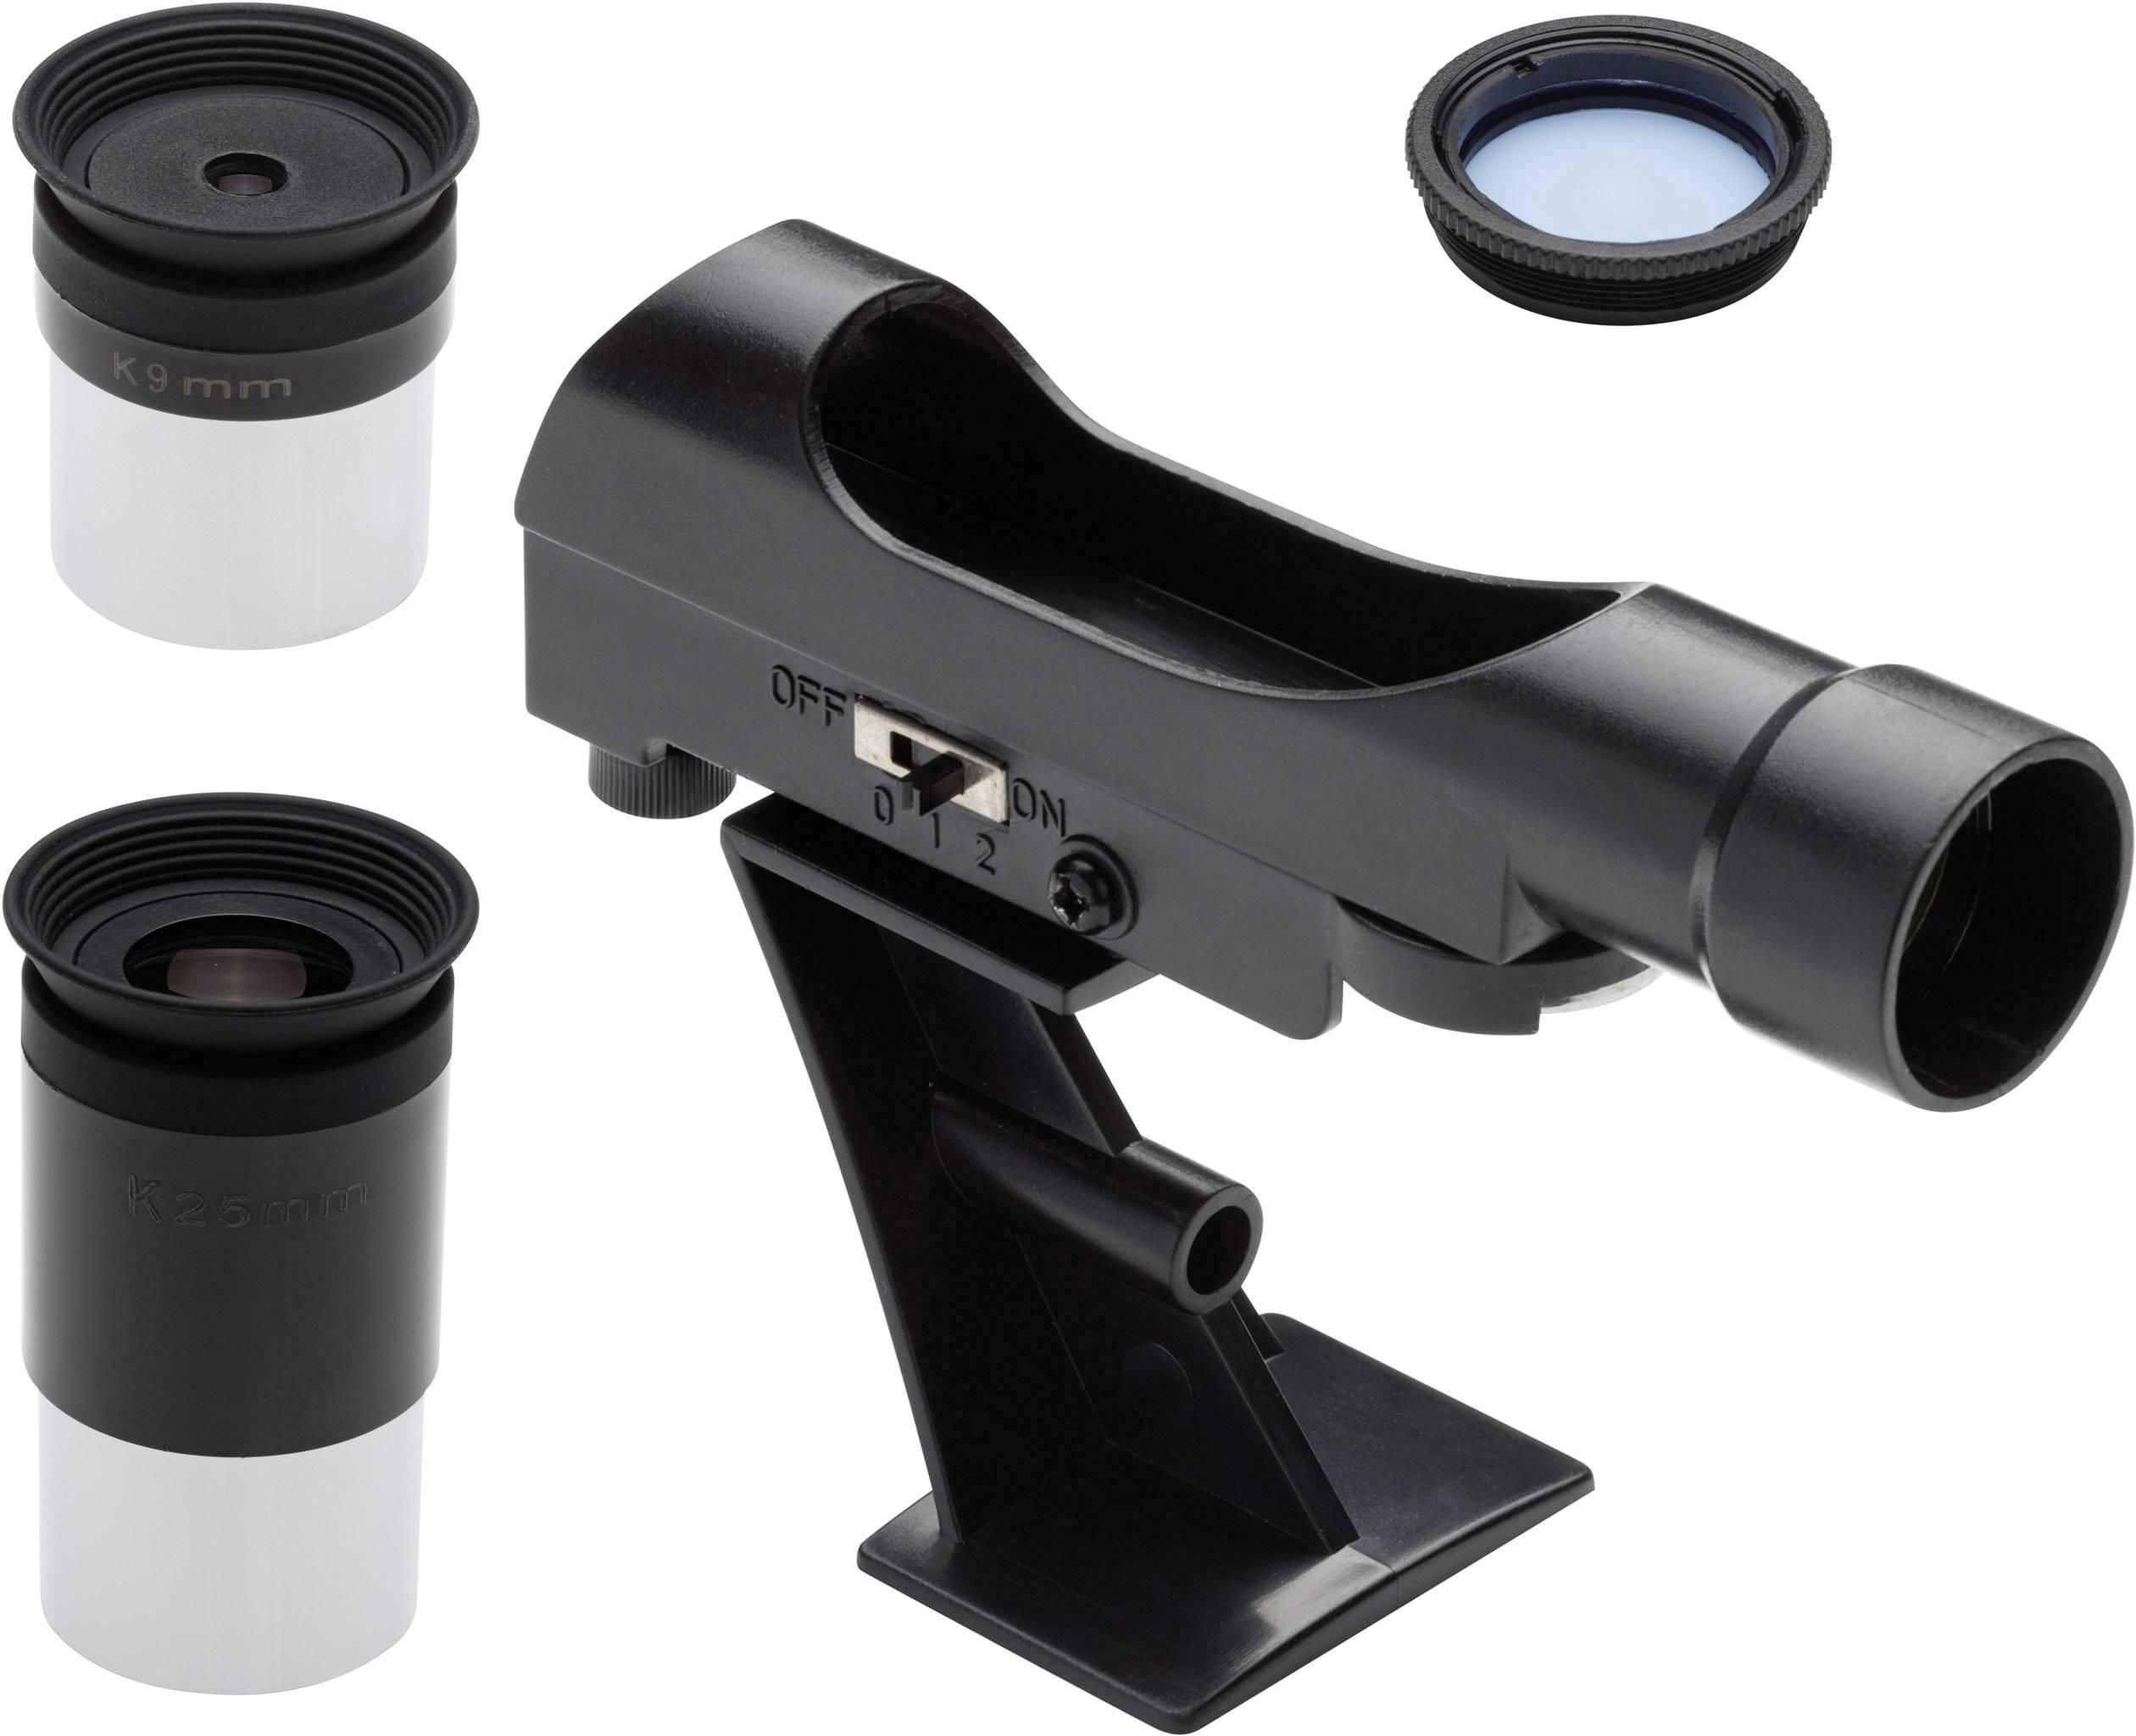 Bresser teleskop marsexplorer amazon kamera